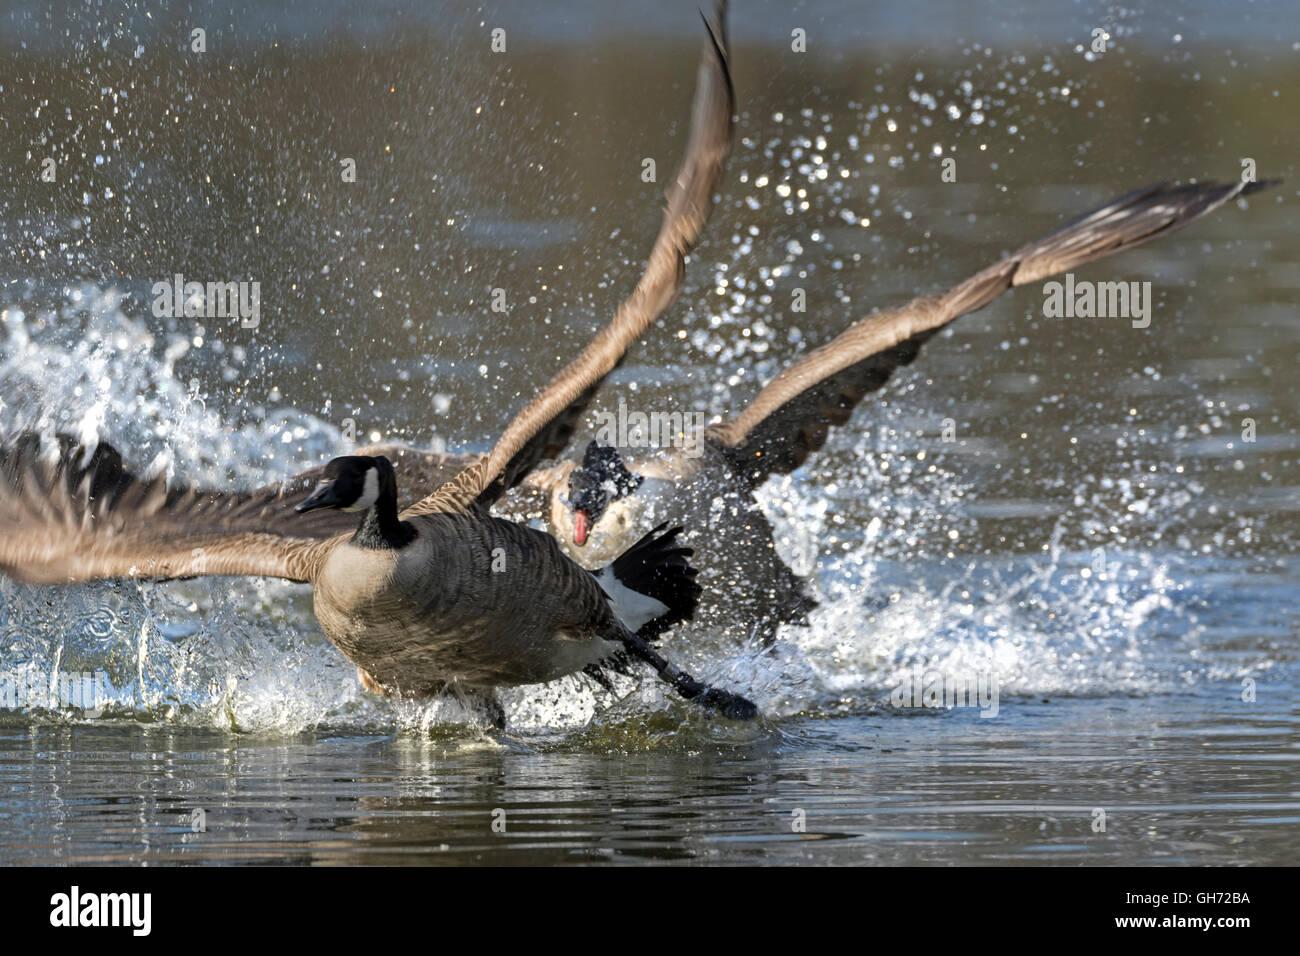 Canada goose (Branta canadensis) in action, Hamburg, Germany, Europe Stock Photo